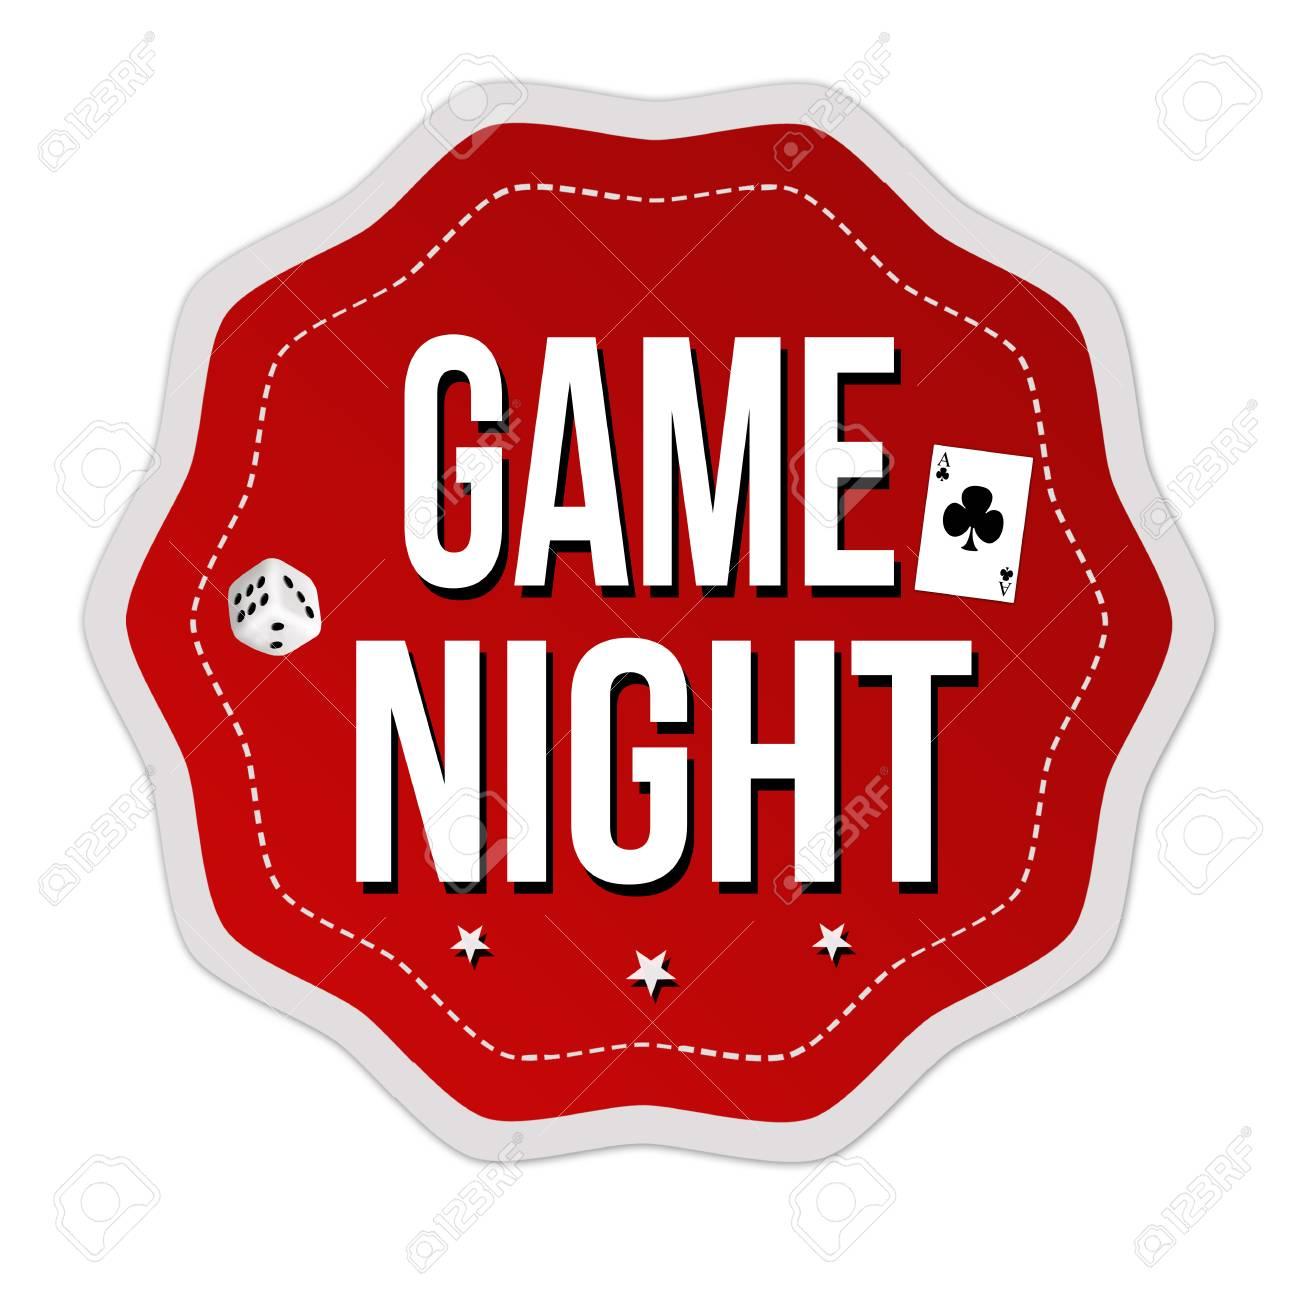 Game night label or sticker.